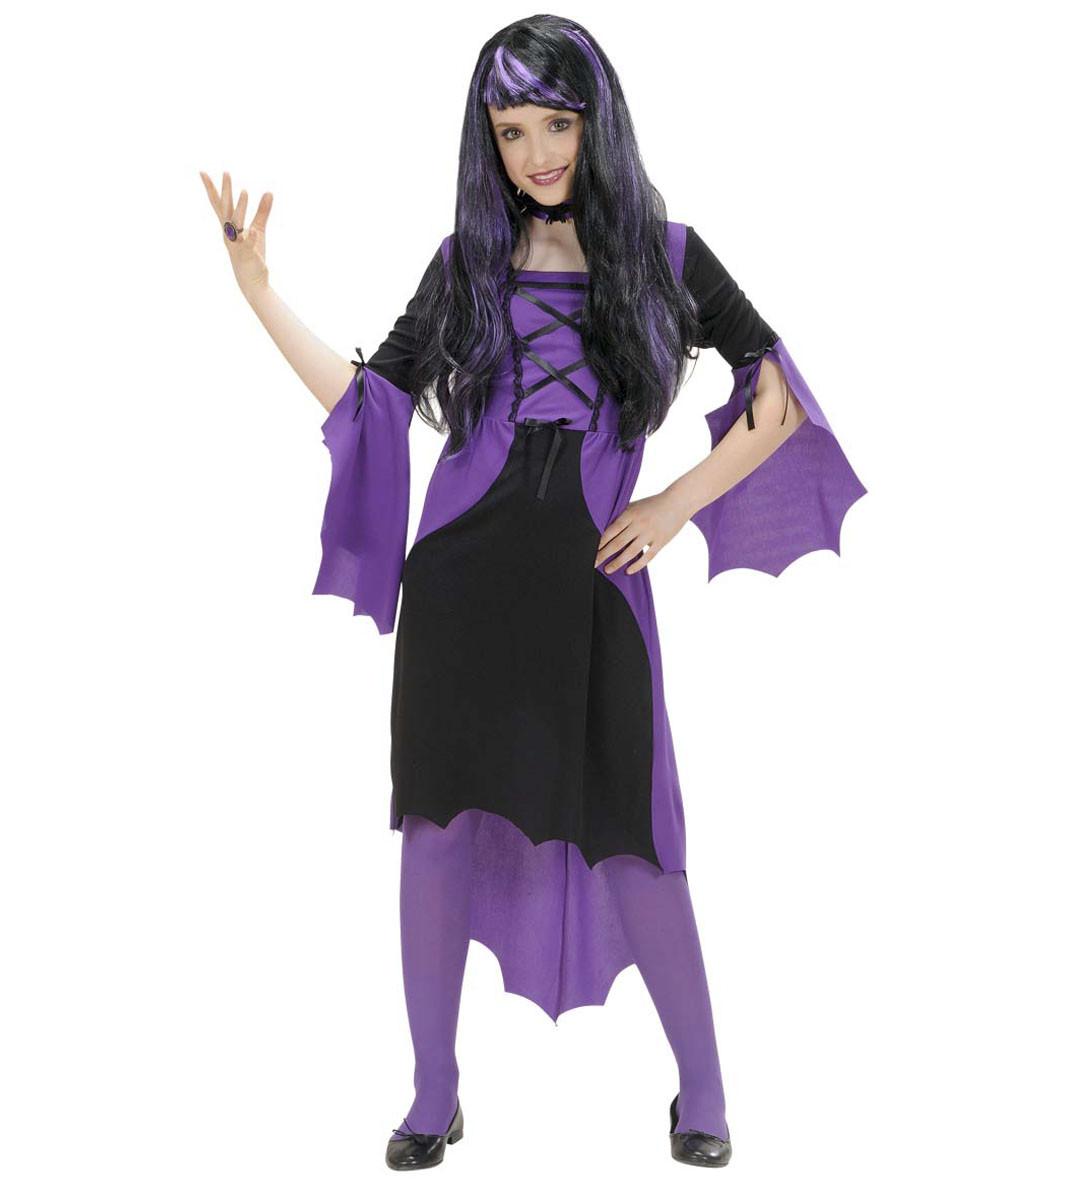 Costume Bambina Halloween Vestito Vampira Ragazza PS 22042